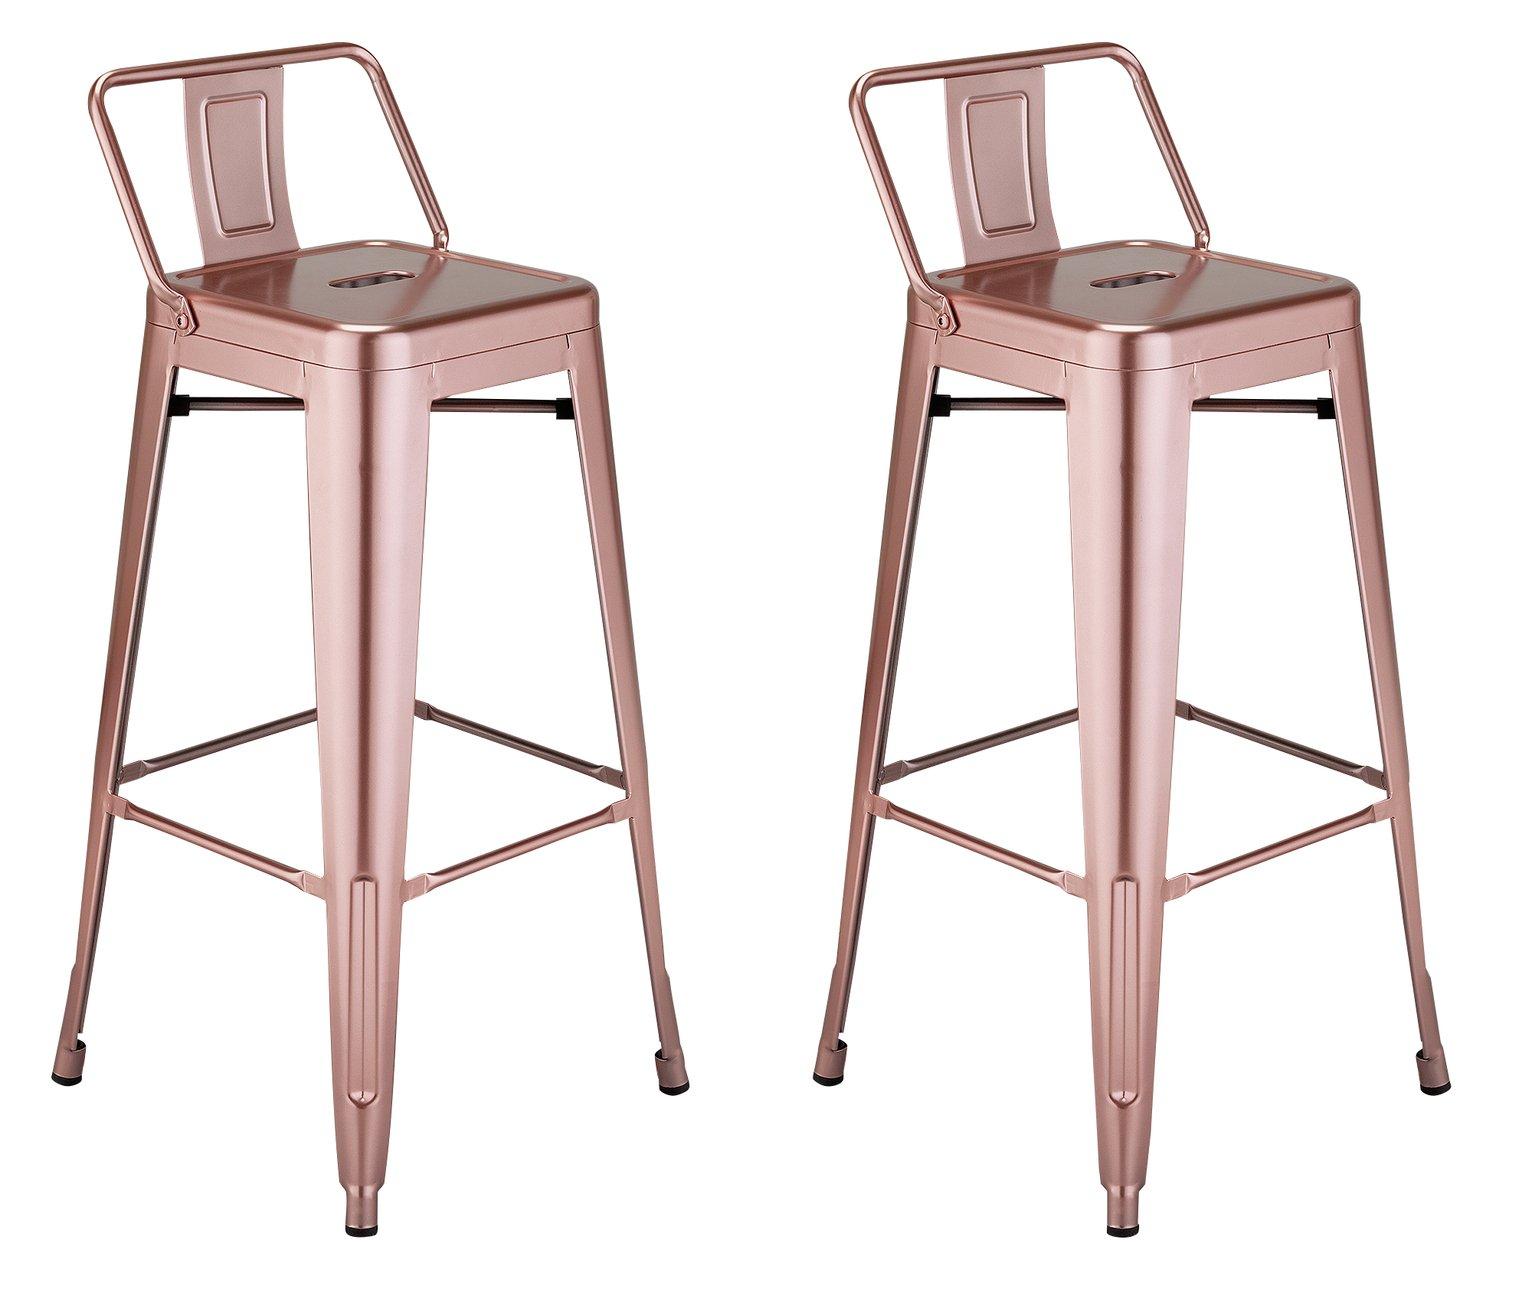 Argos Home Industrial Pair of Metal Bar Stools - Pink